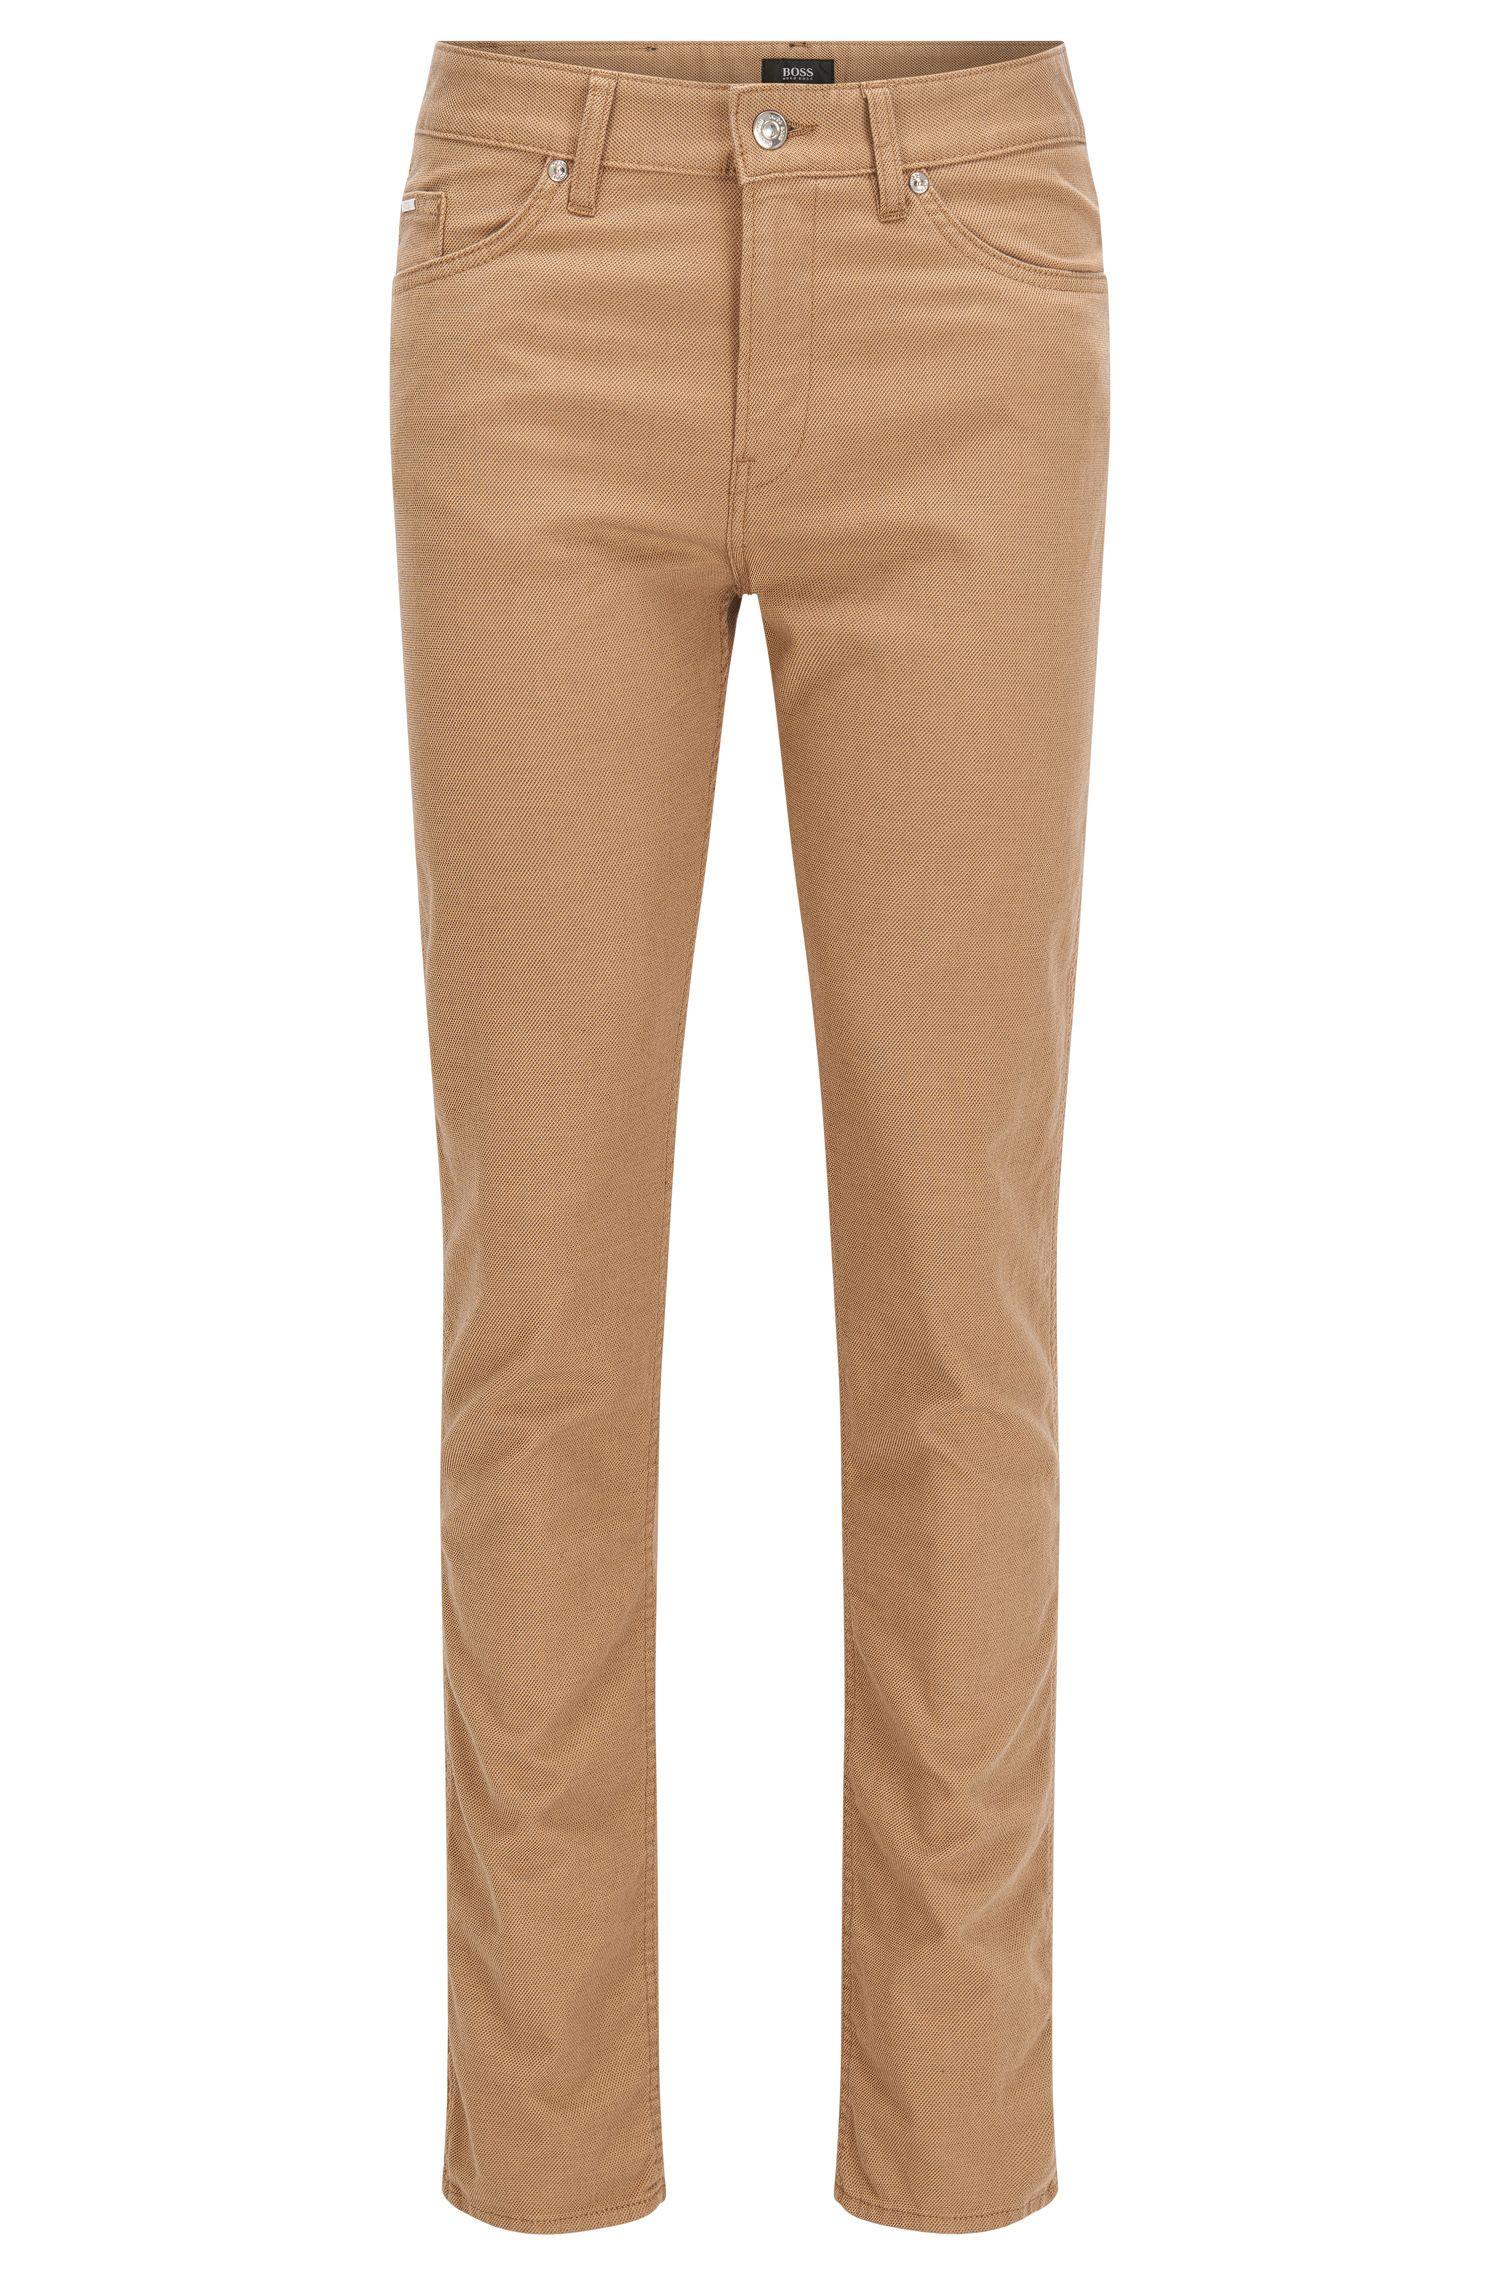 Jeans Slim Fit en denim stretch au look bicolore